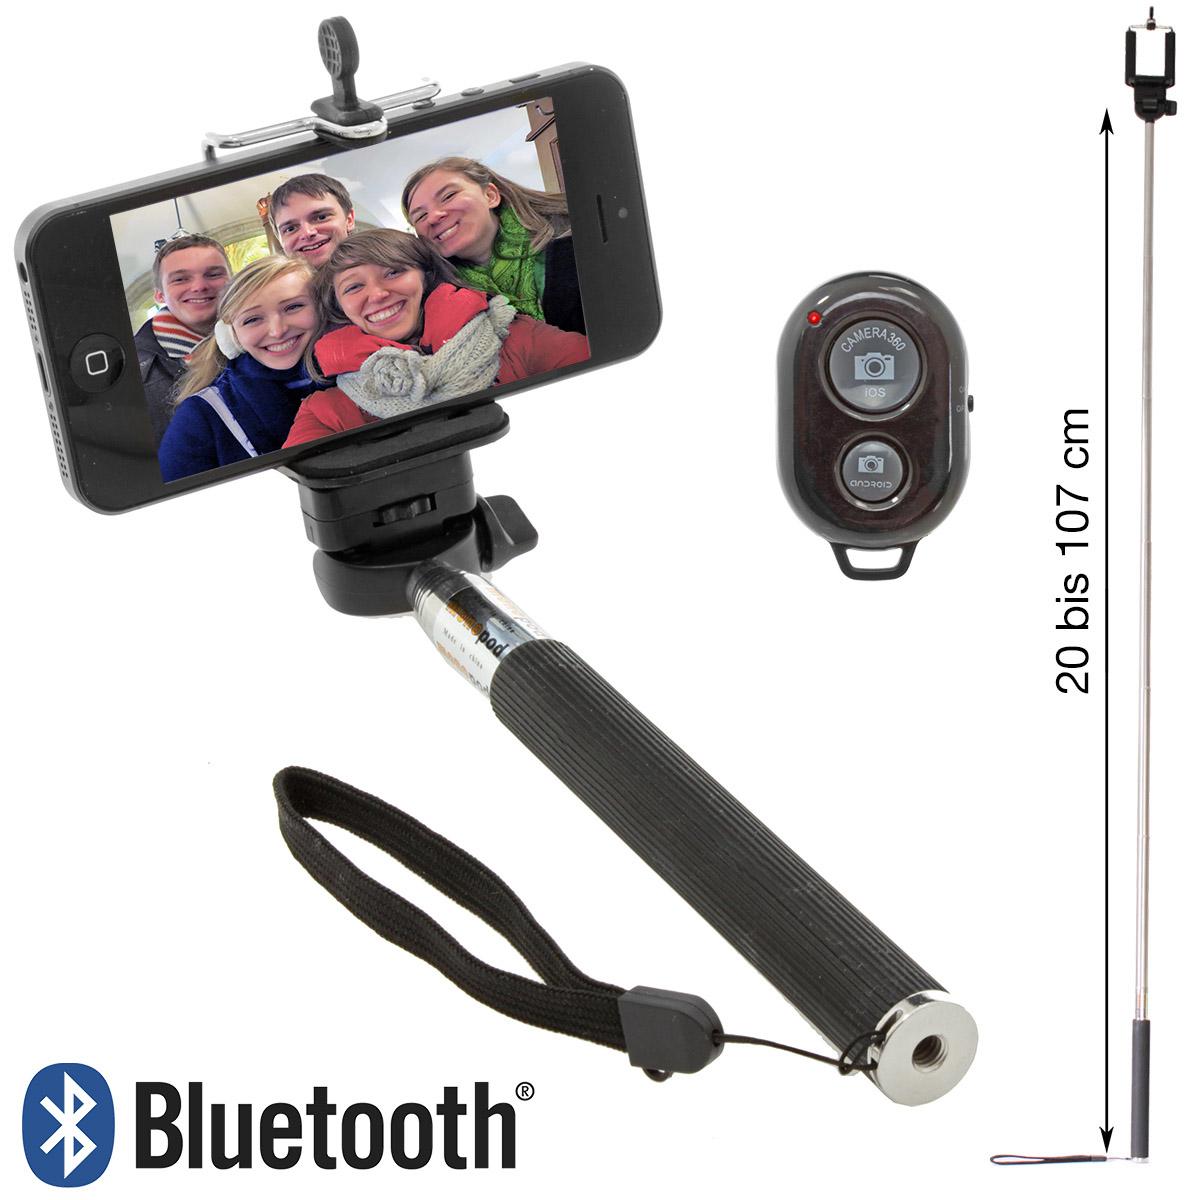 selfie stange bluetooth selbstausl ser fernbedienung ios android smartphone ebay. Black Bedroom Furniture Sets. Home Design Ideas